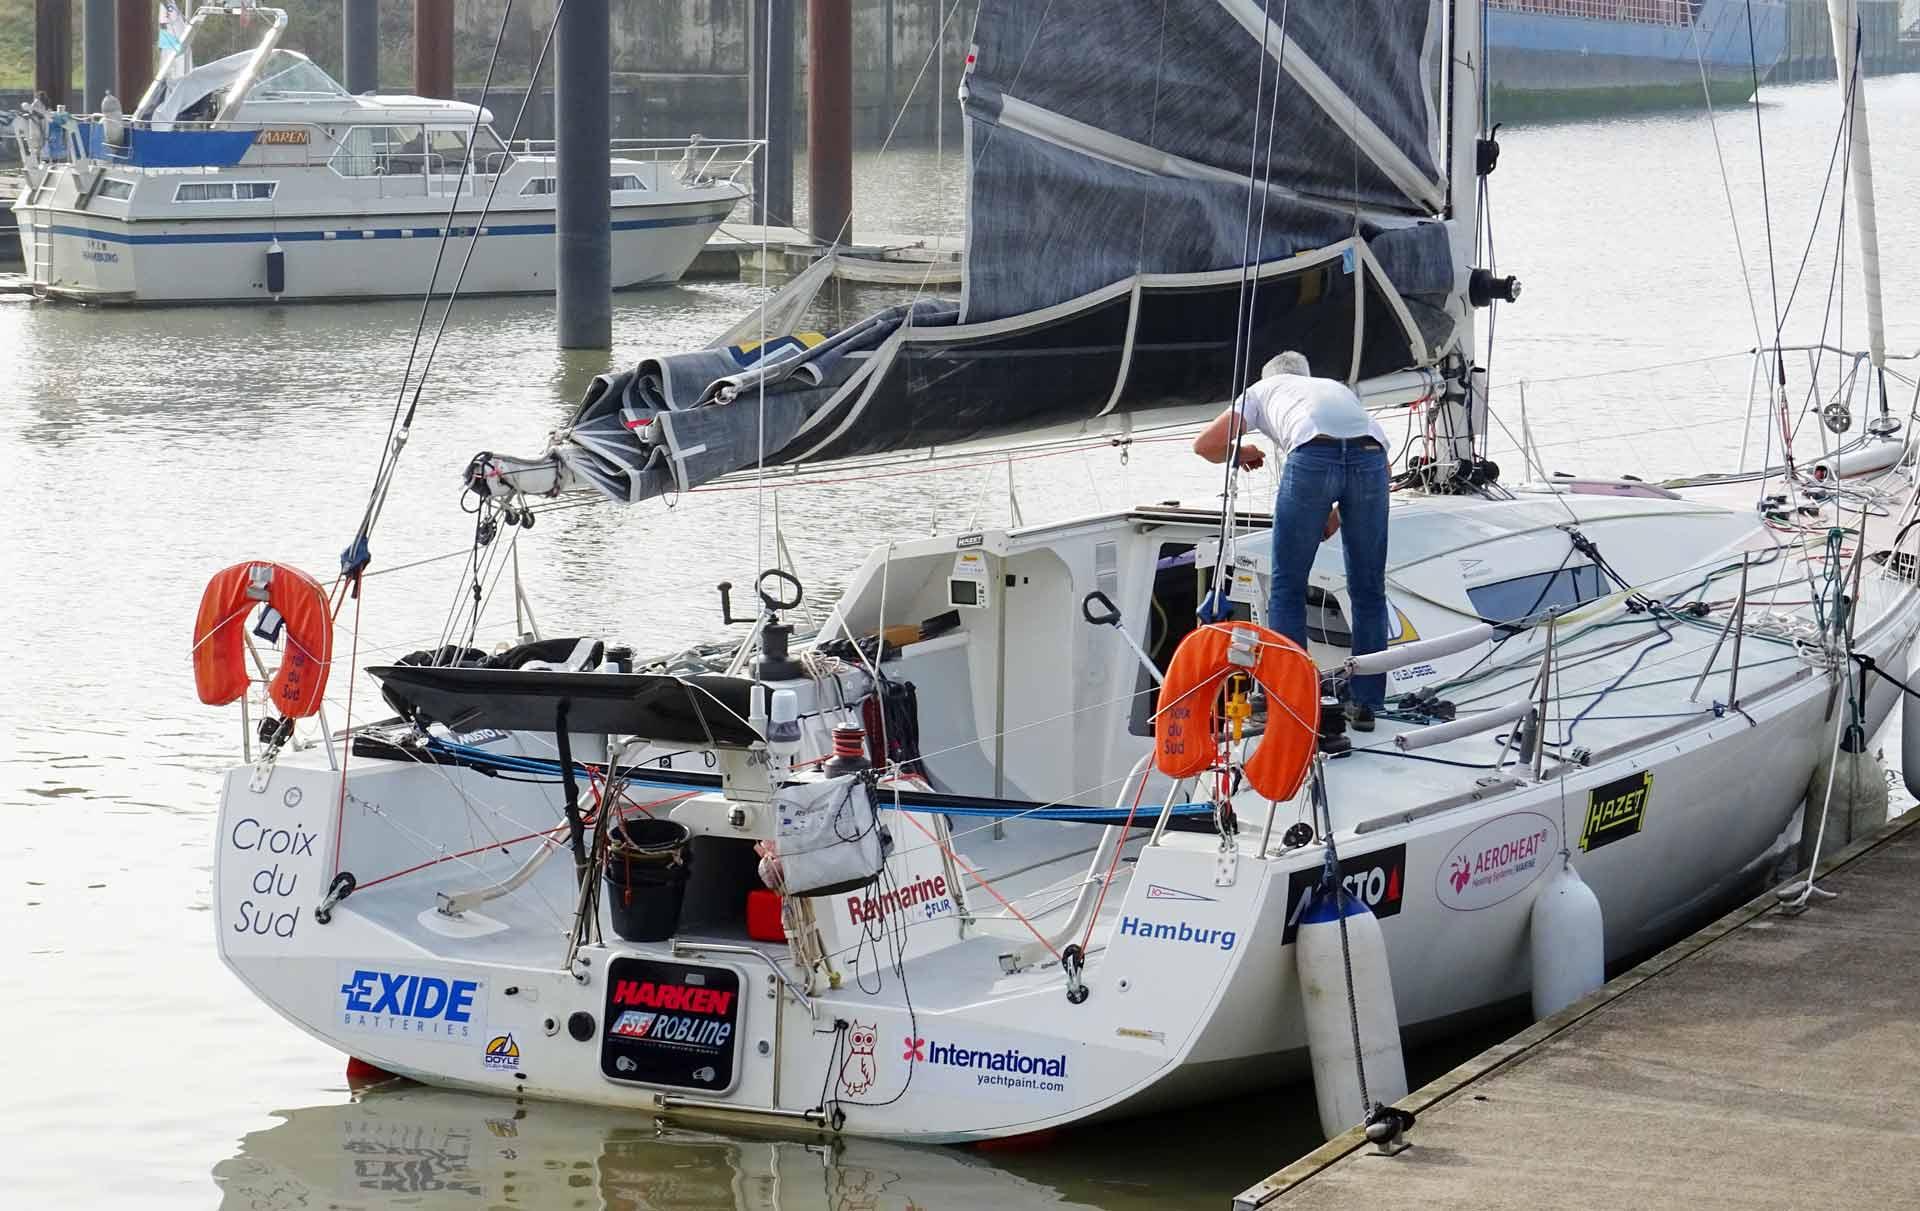 Henrik Masekowitz aboard CROIX DU SUD: Last preps for casting off